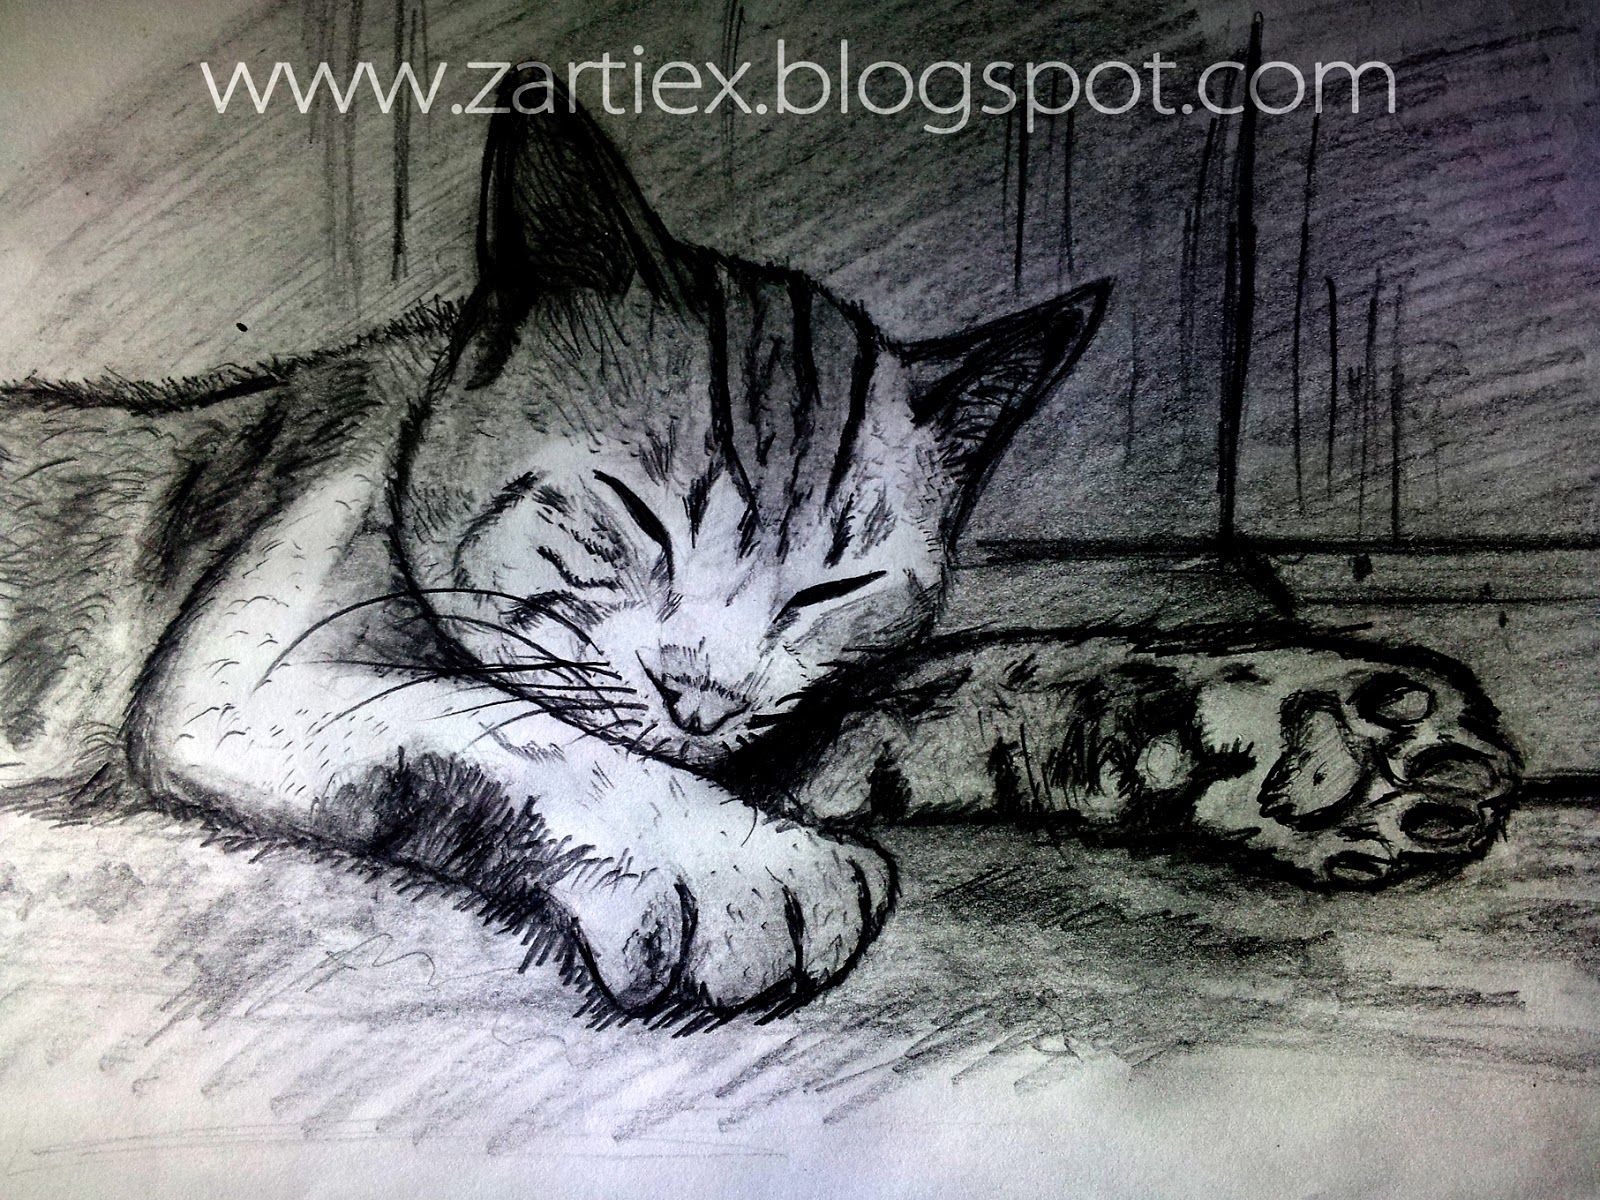 Dibujos de animales realistas - Dibujos de gatos - Zartiex